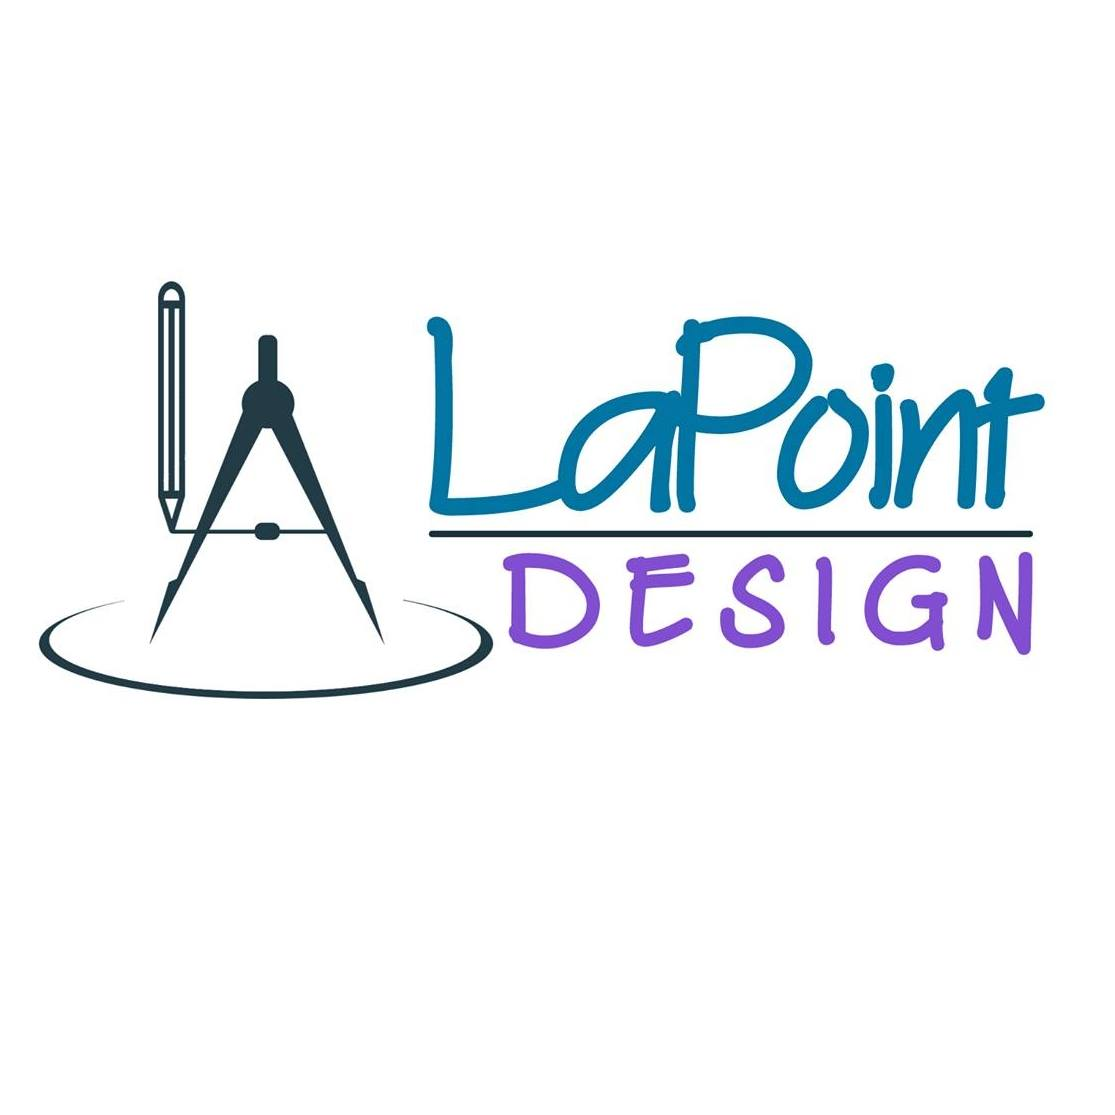 LaPoint Design logo